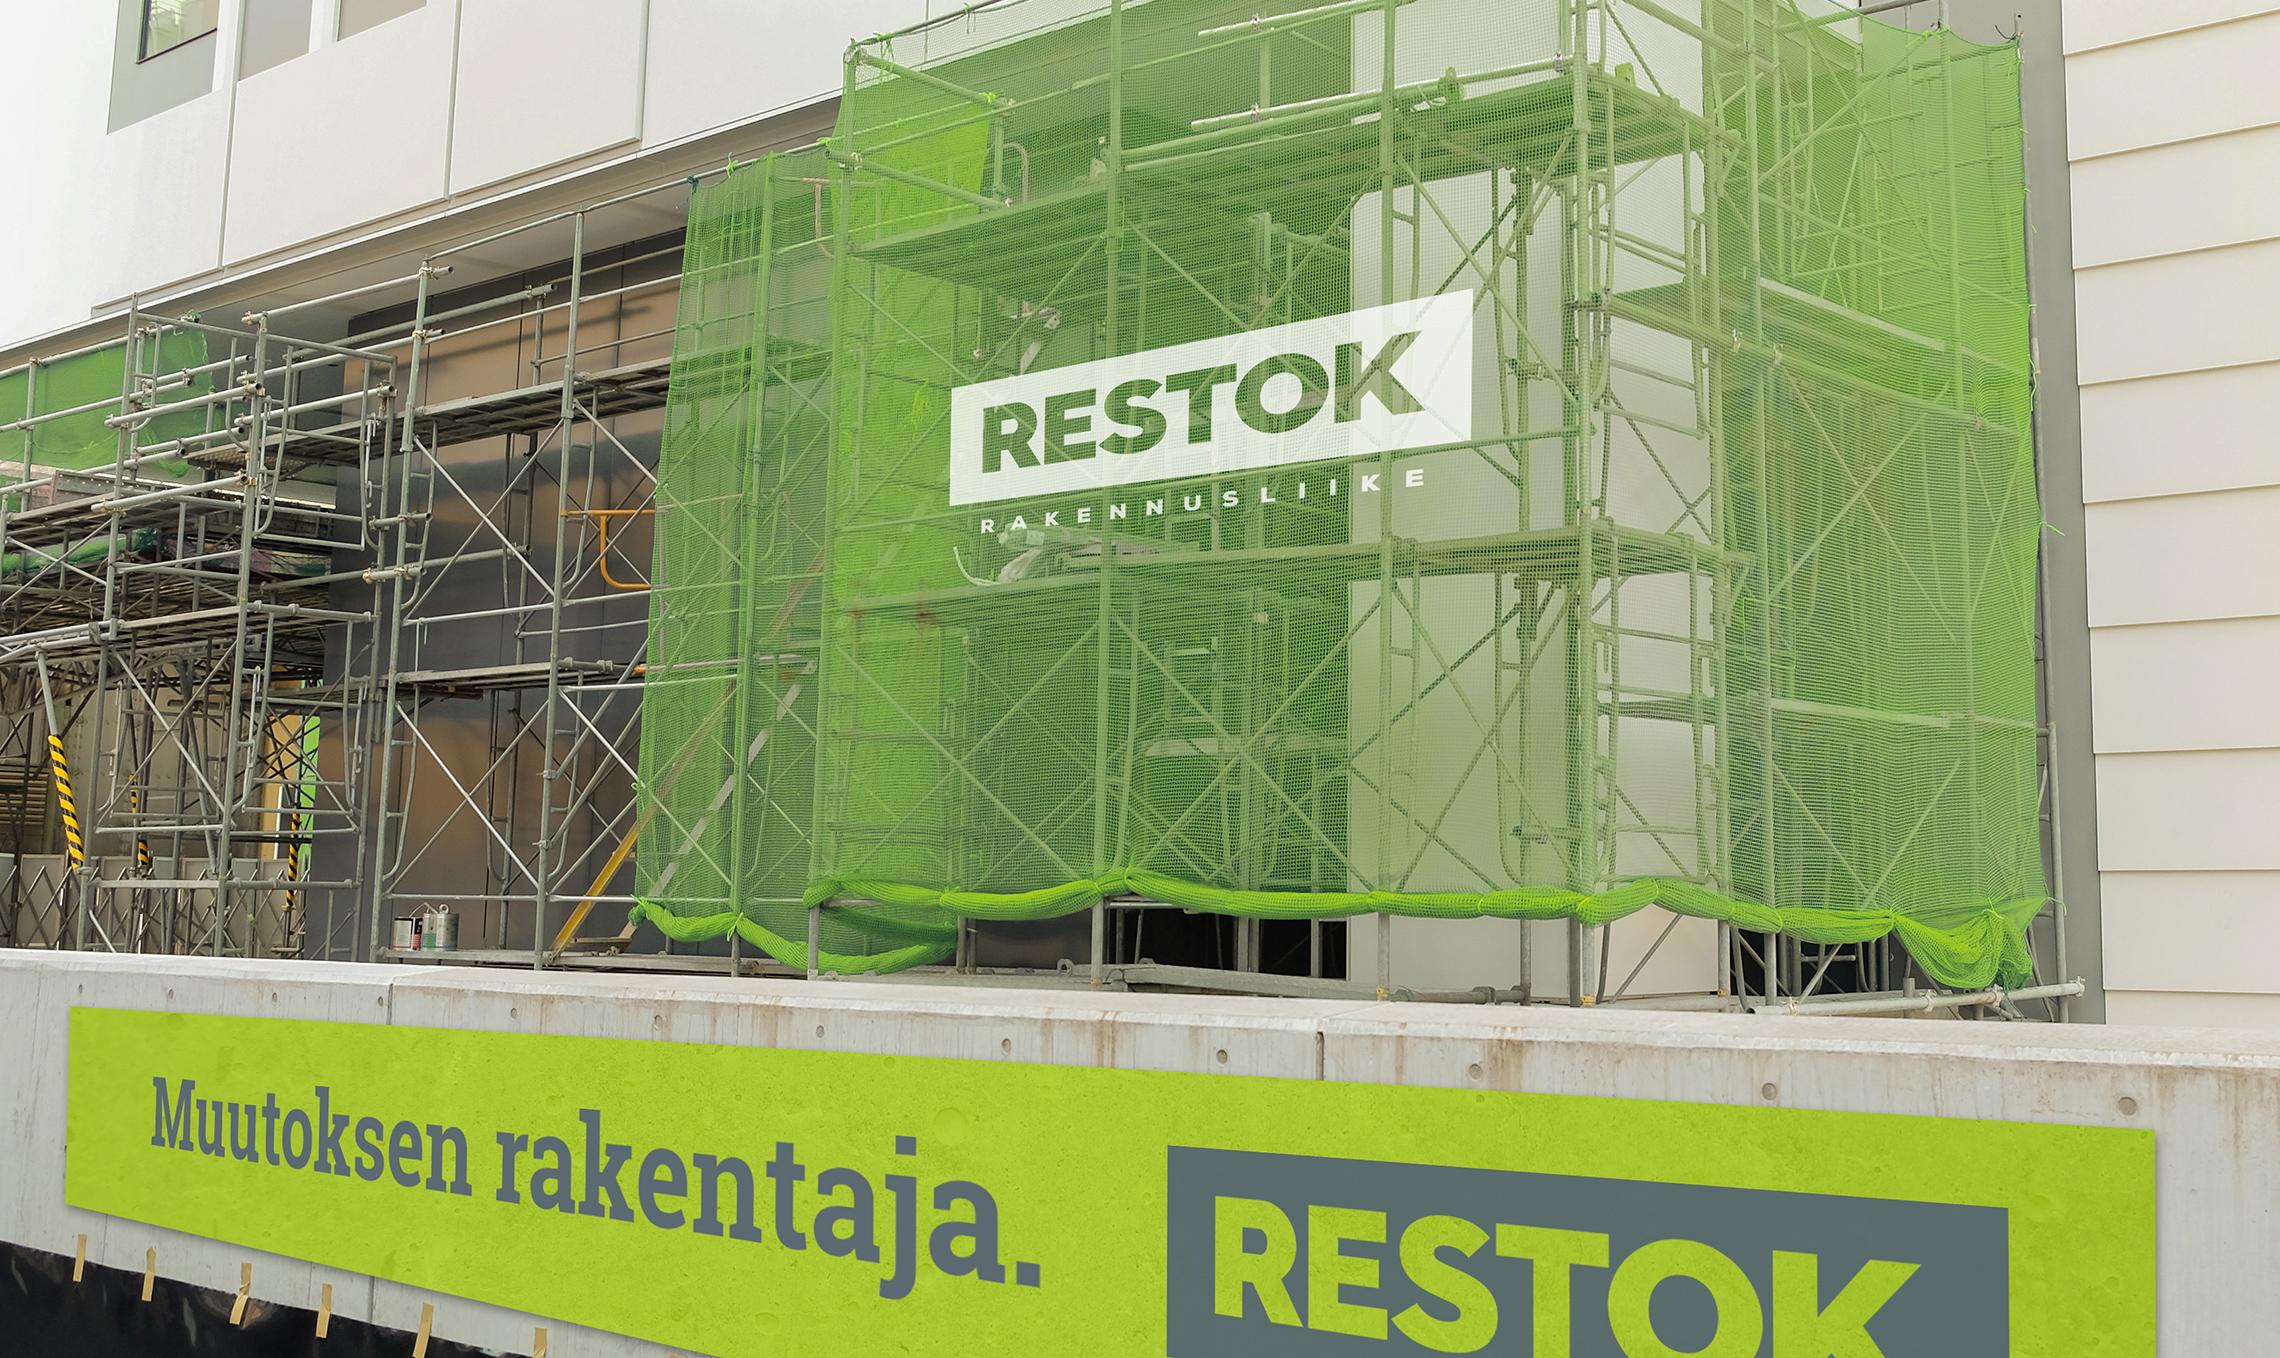 restok_tyomaanakyvyys_mockup